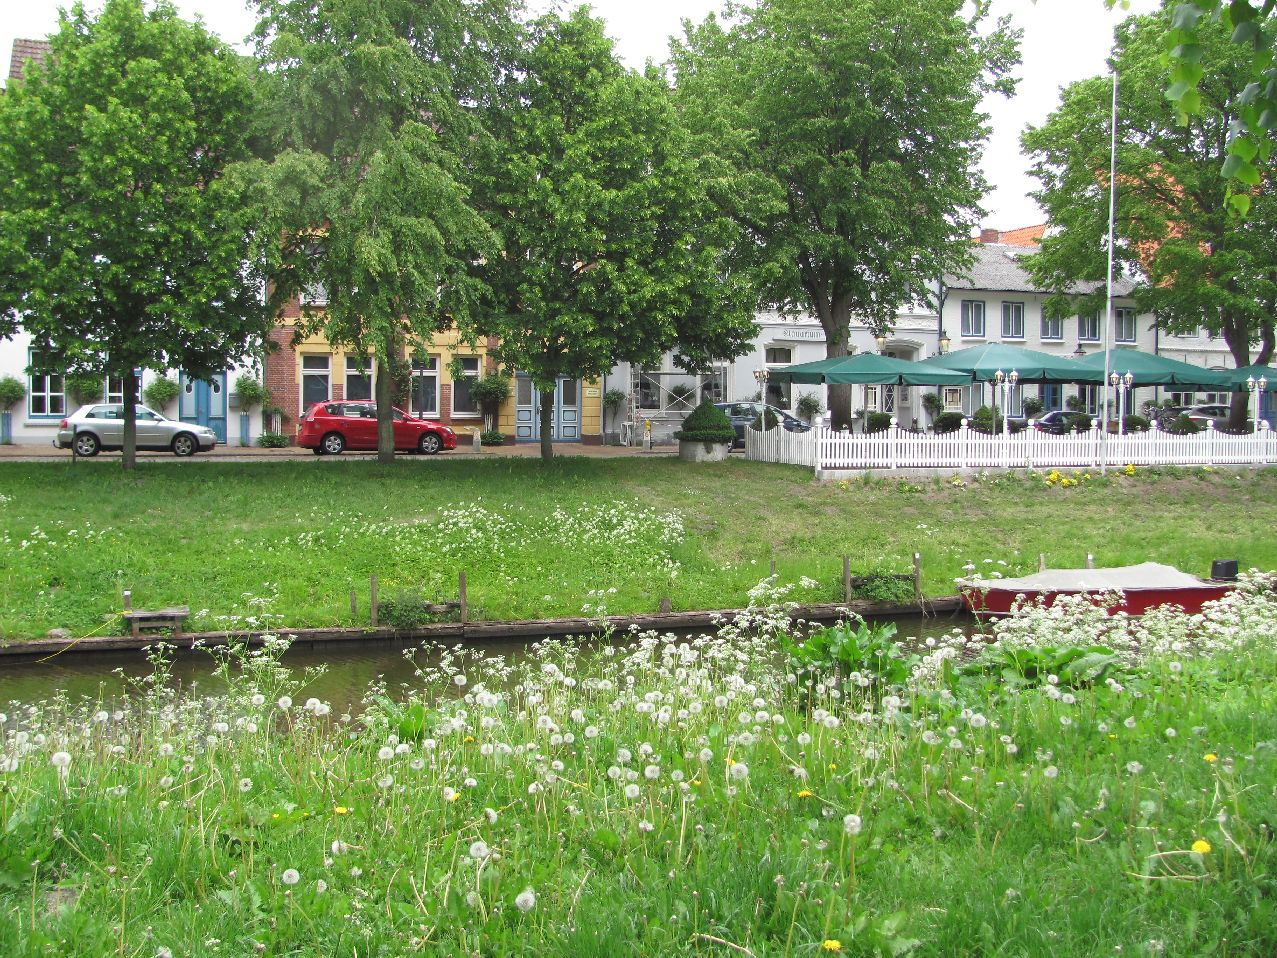 cdu-schleswigfahrt-2011_25